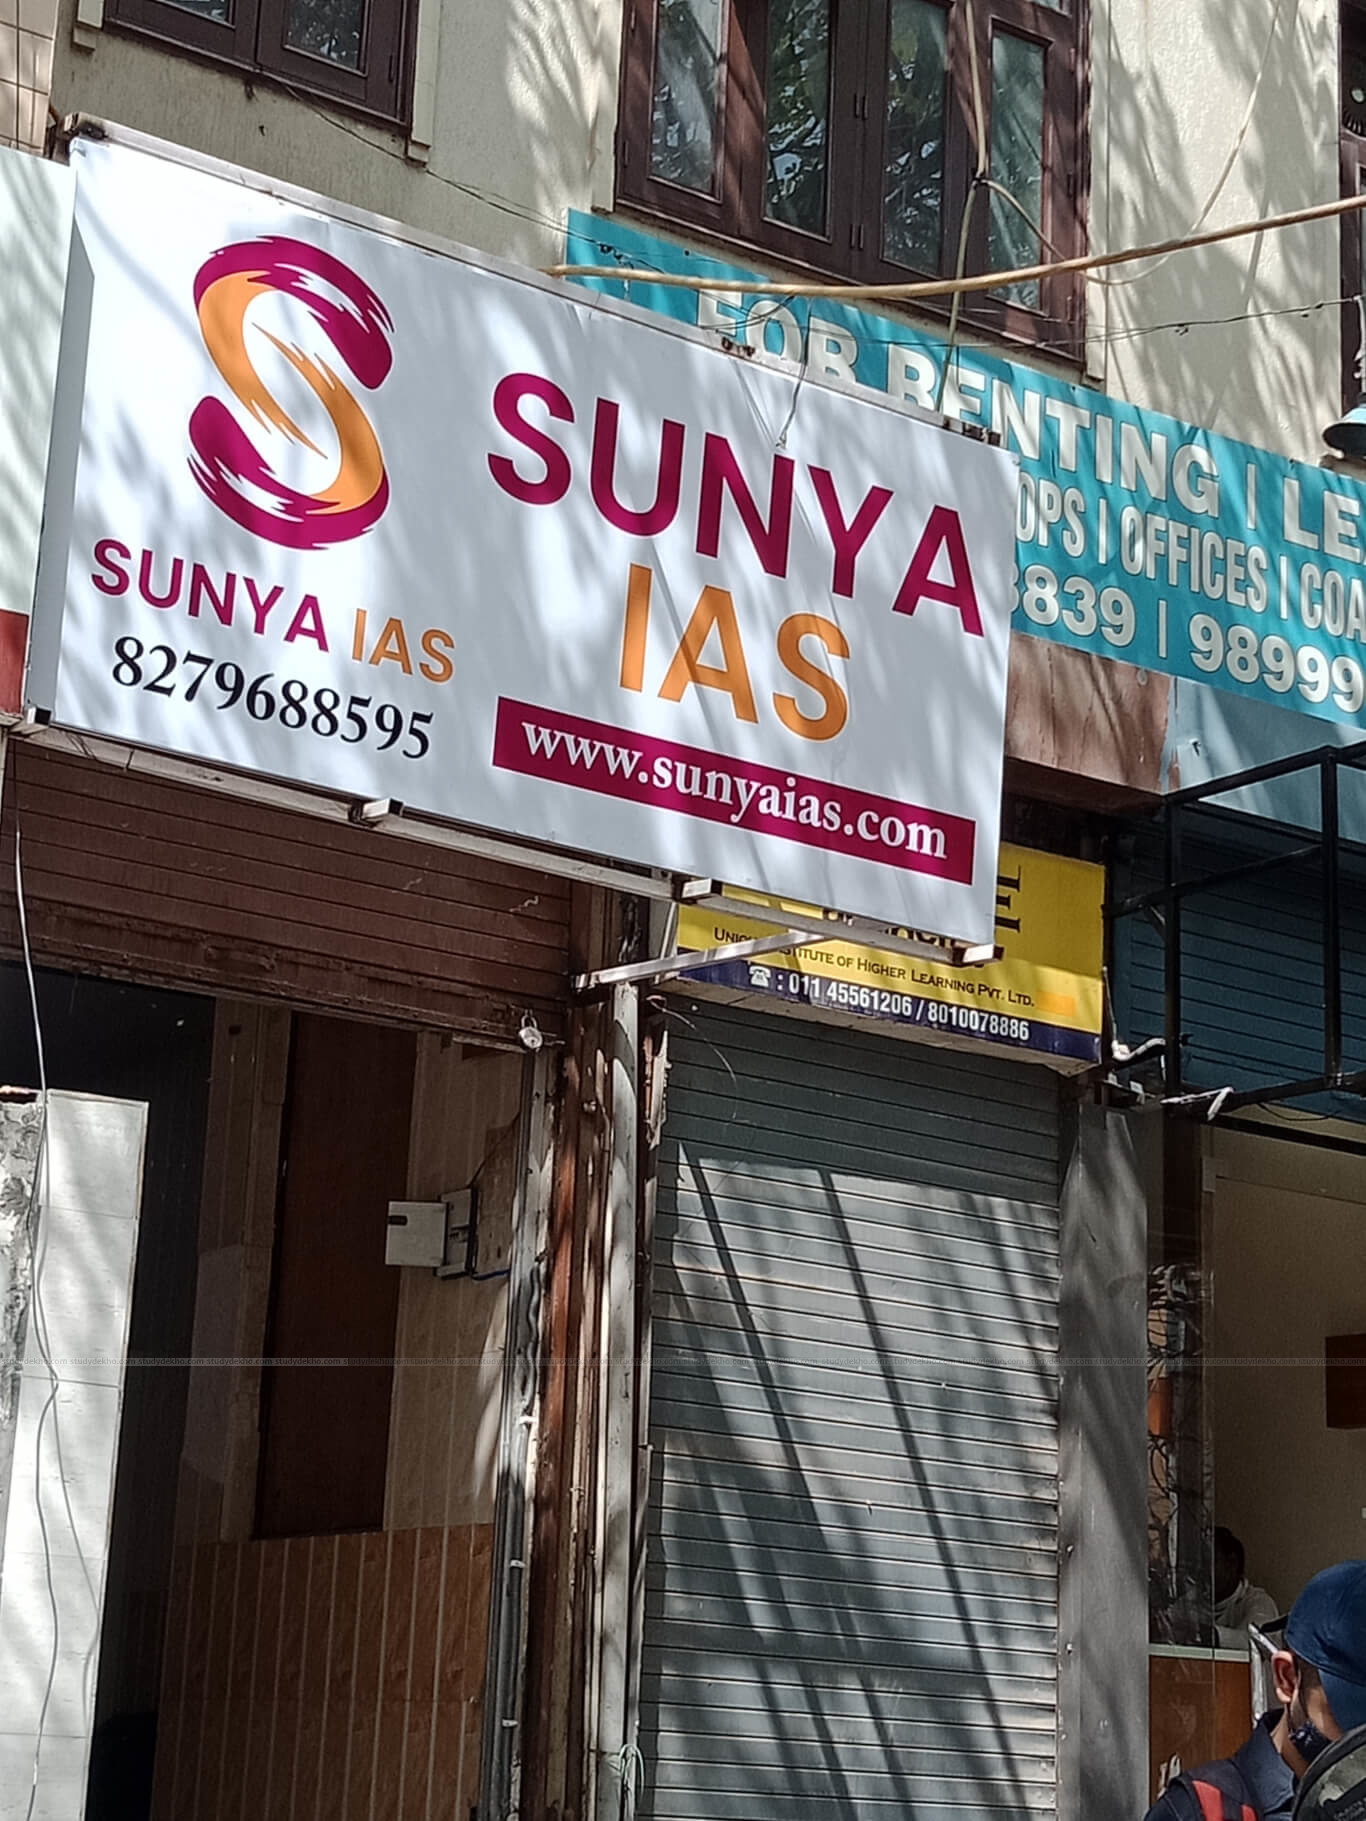 SUNYA IAS Logo